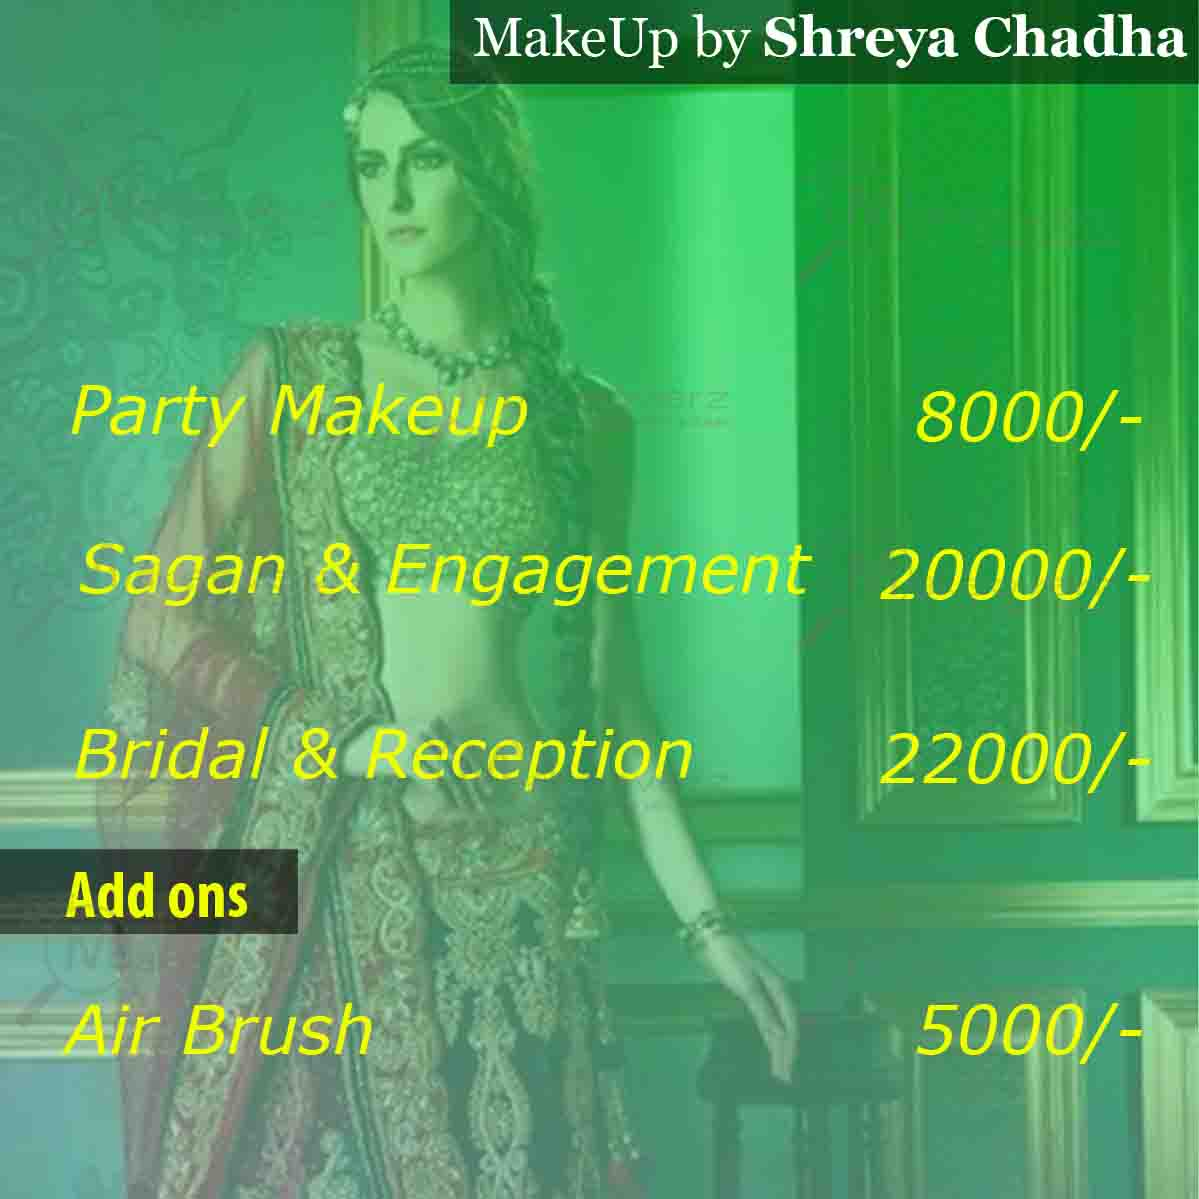 Shreya Chadha Makeovers - DLF Phase 1